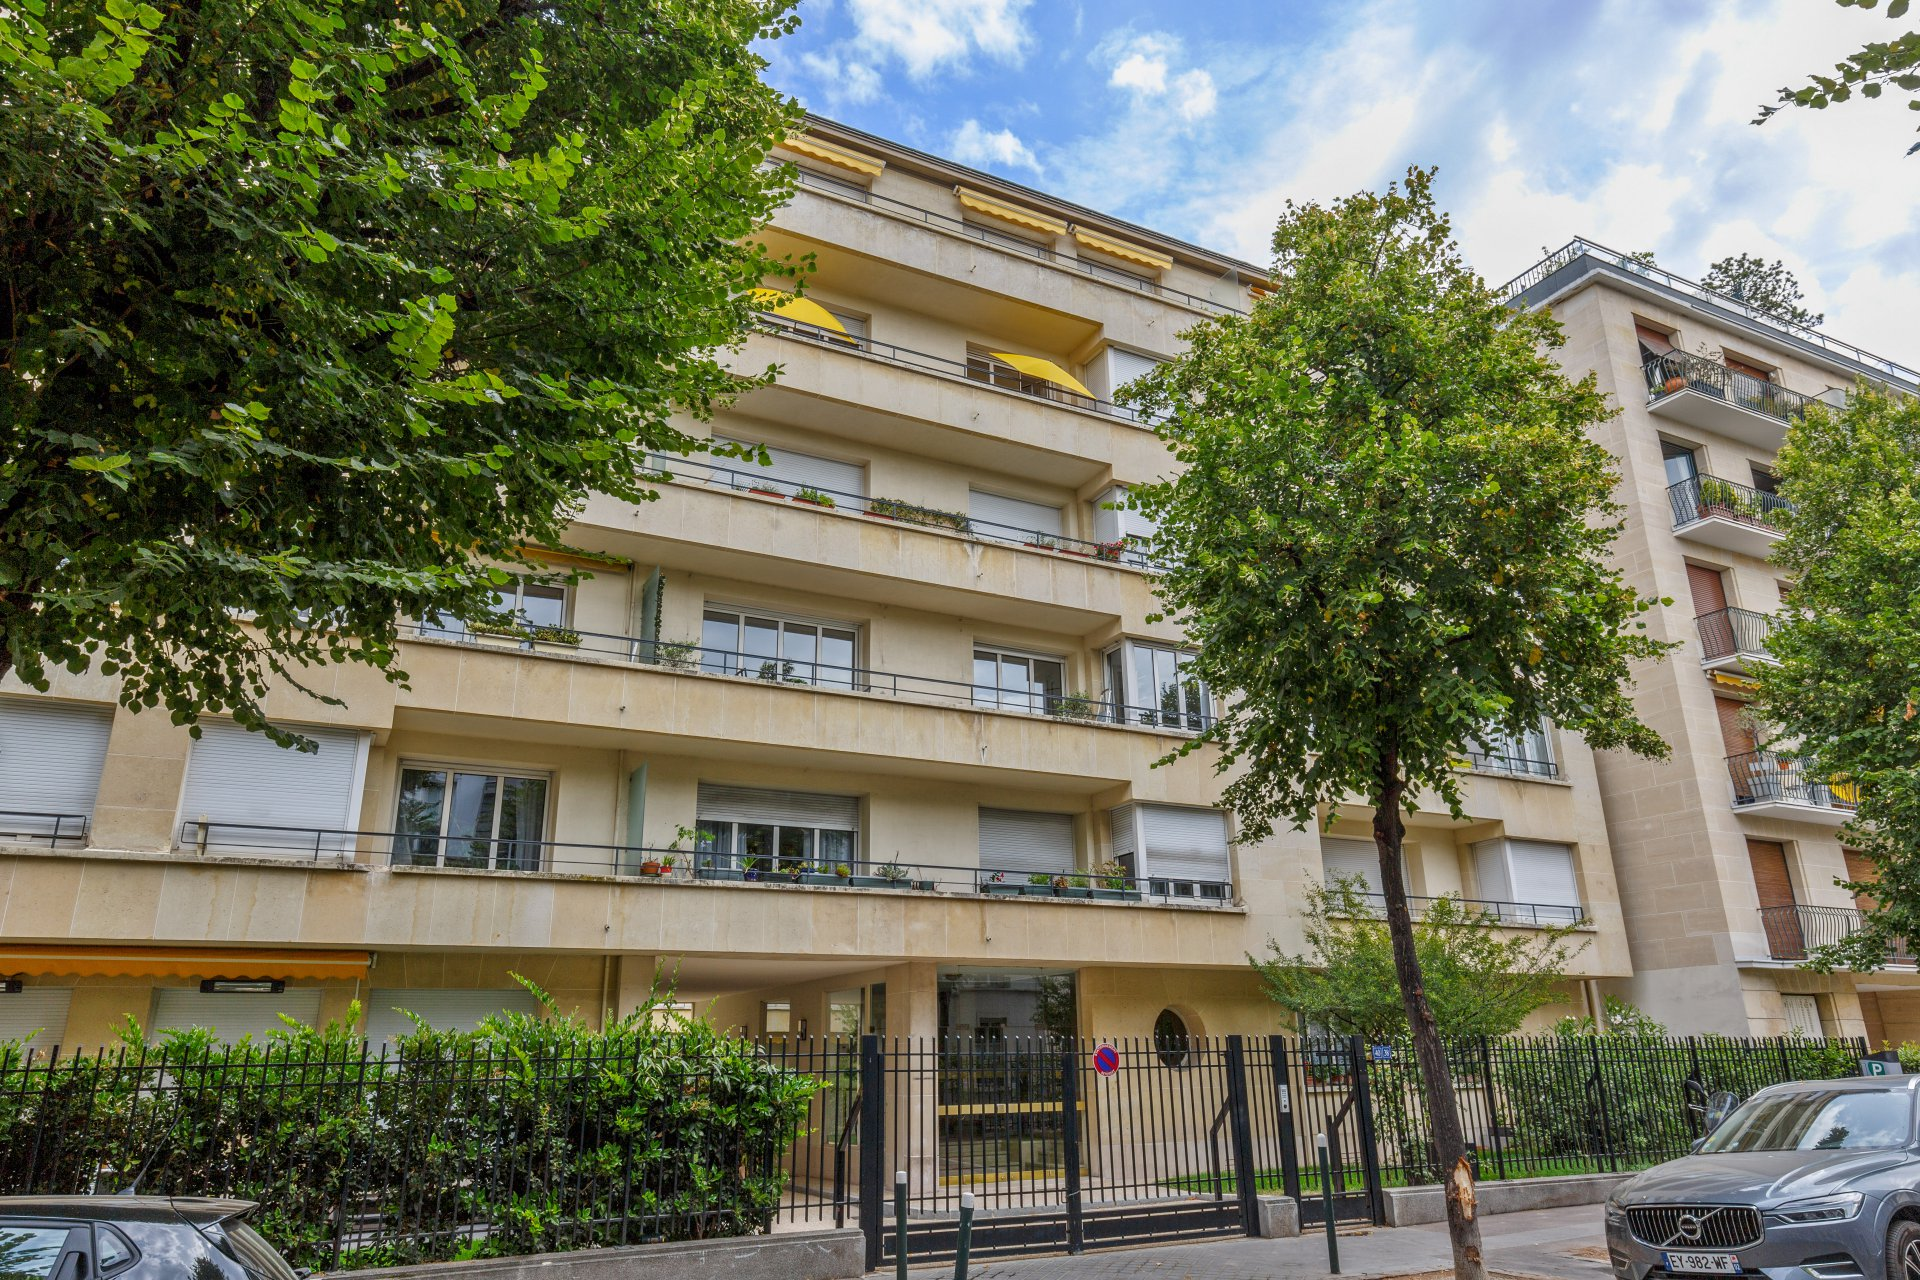 Annonce location appartement neuilly sur seine sablons - Chambre a louer neuilly sur seine ...